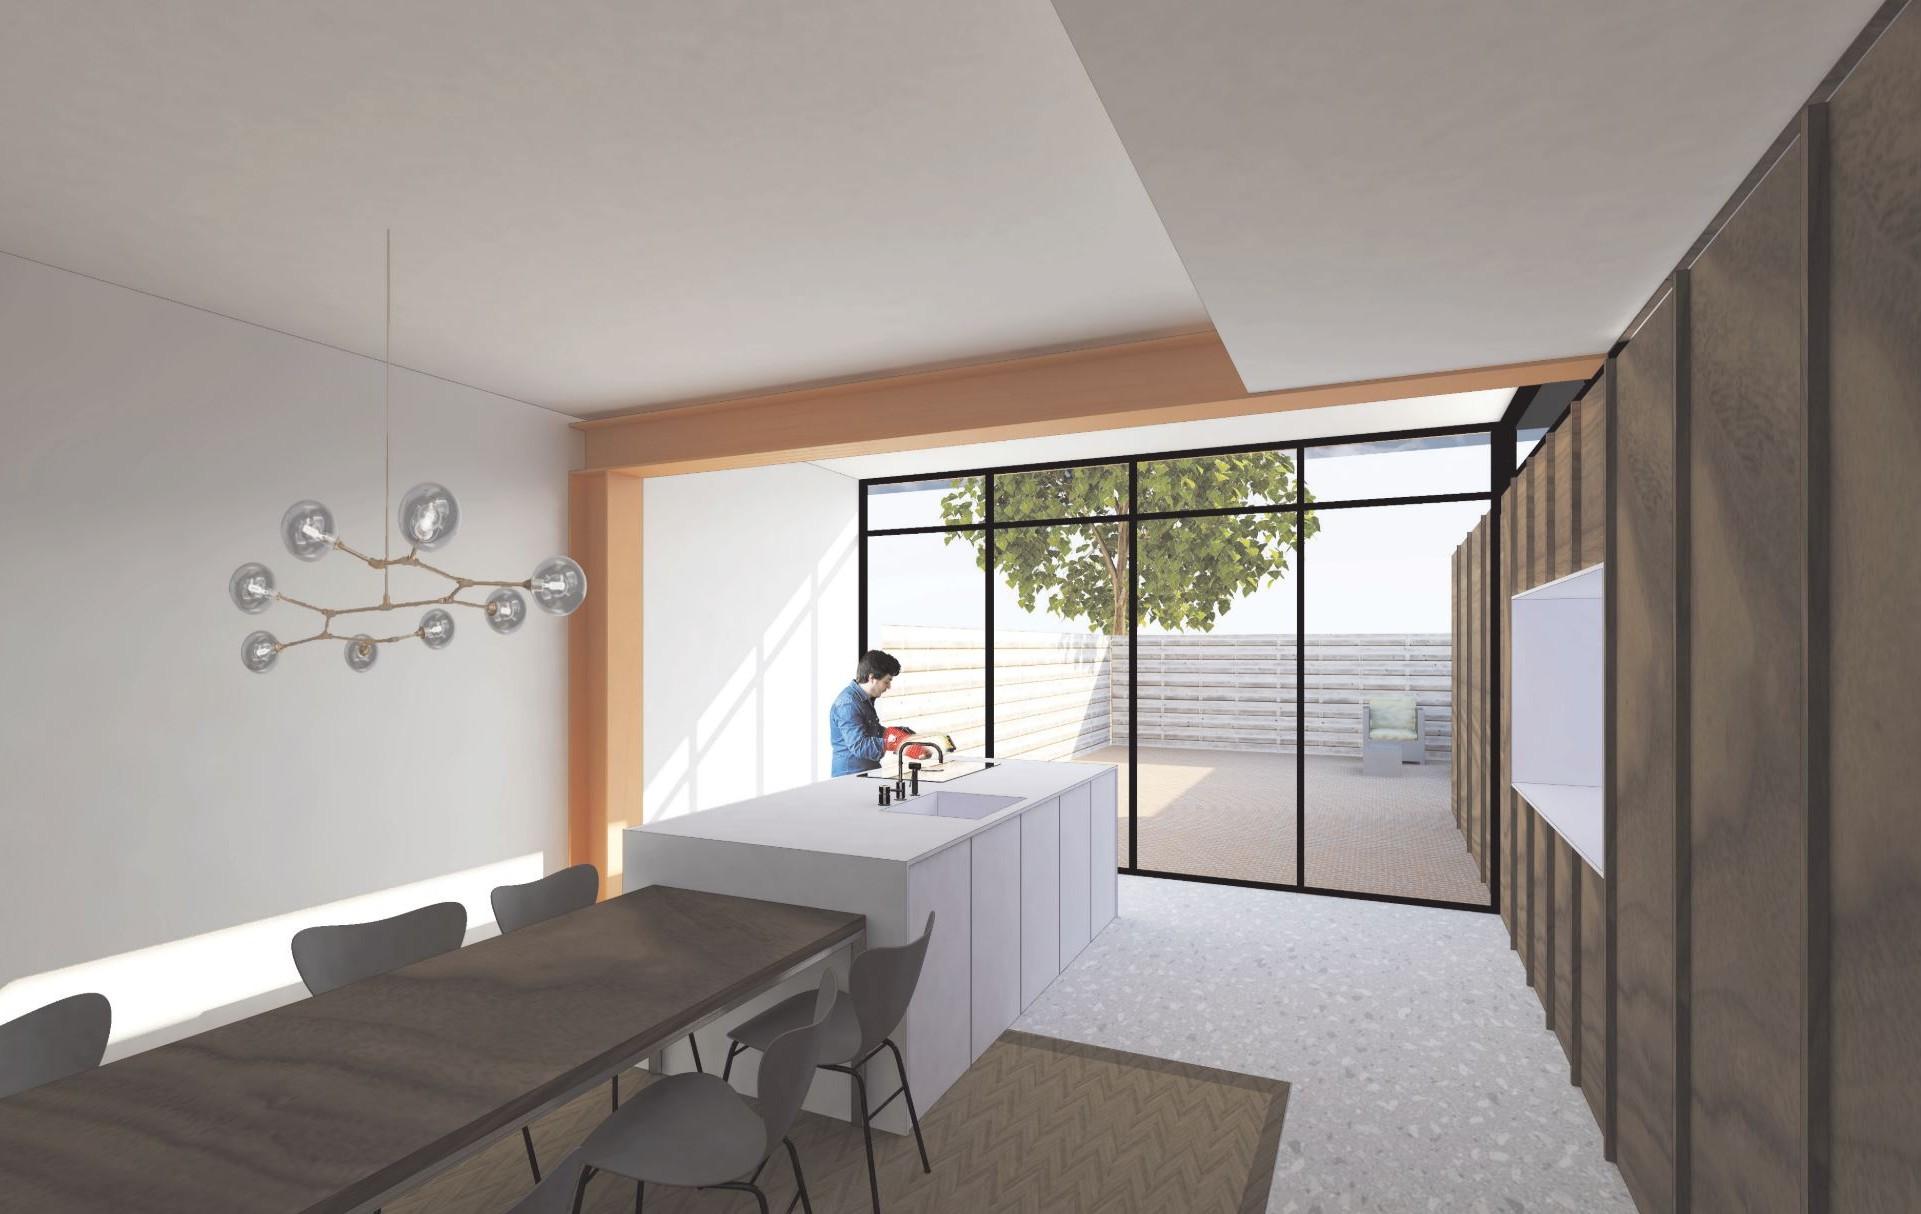 LAGADOarchitects_verbouwing_uitbouw_colourful_kleurrijk_Leiden_WIP_dontmoveimprove_extension_interior